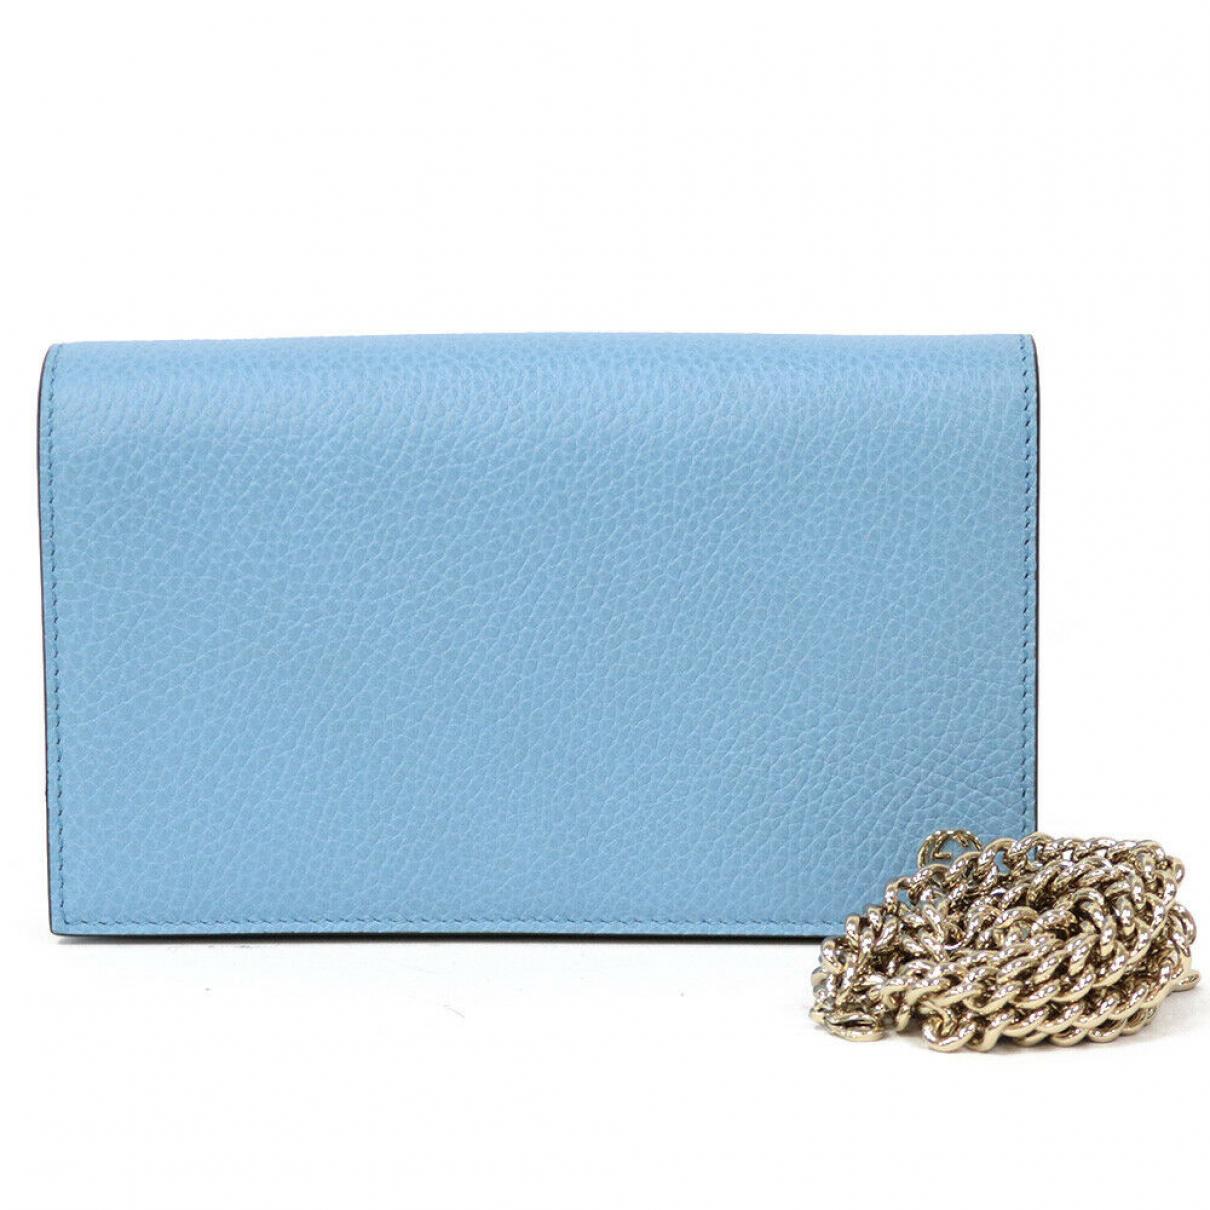 Gucci N wallet for Women N